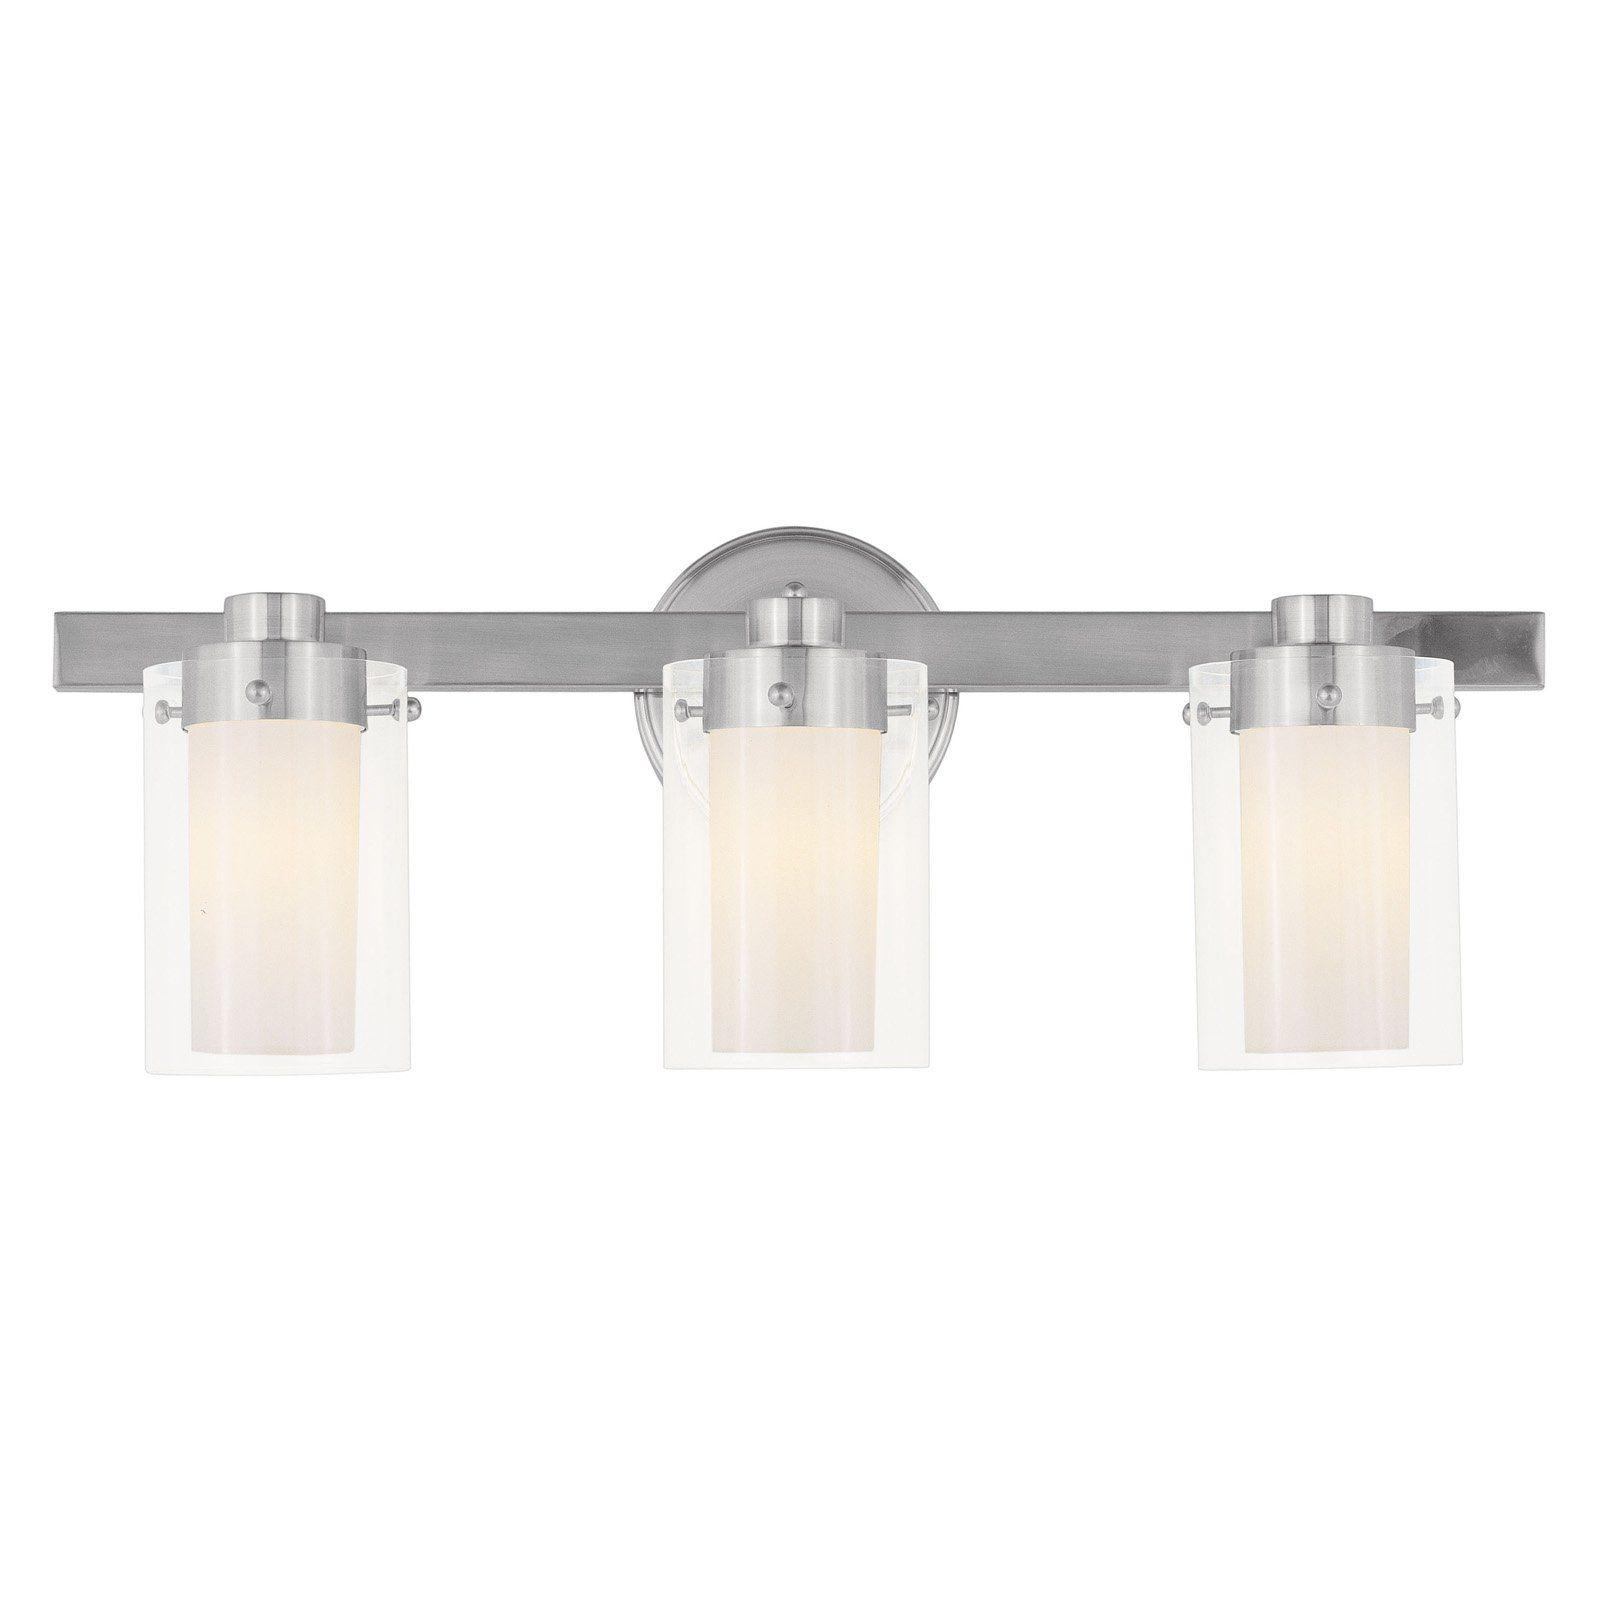 Photo of Livex Manhattan 1543-91 3-light bathroom wall light – 22.5 W in. – Brushed nickel